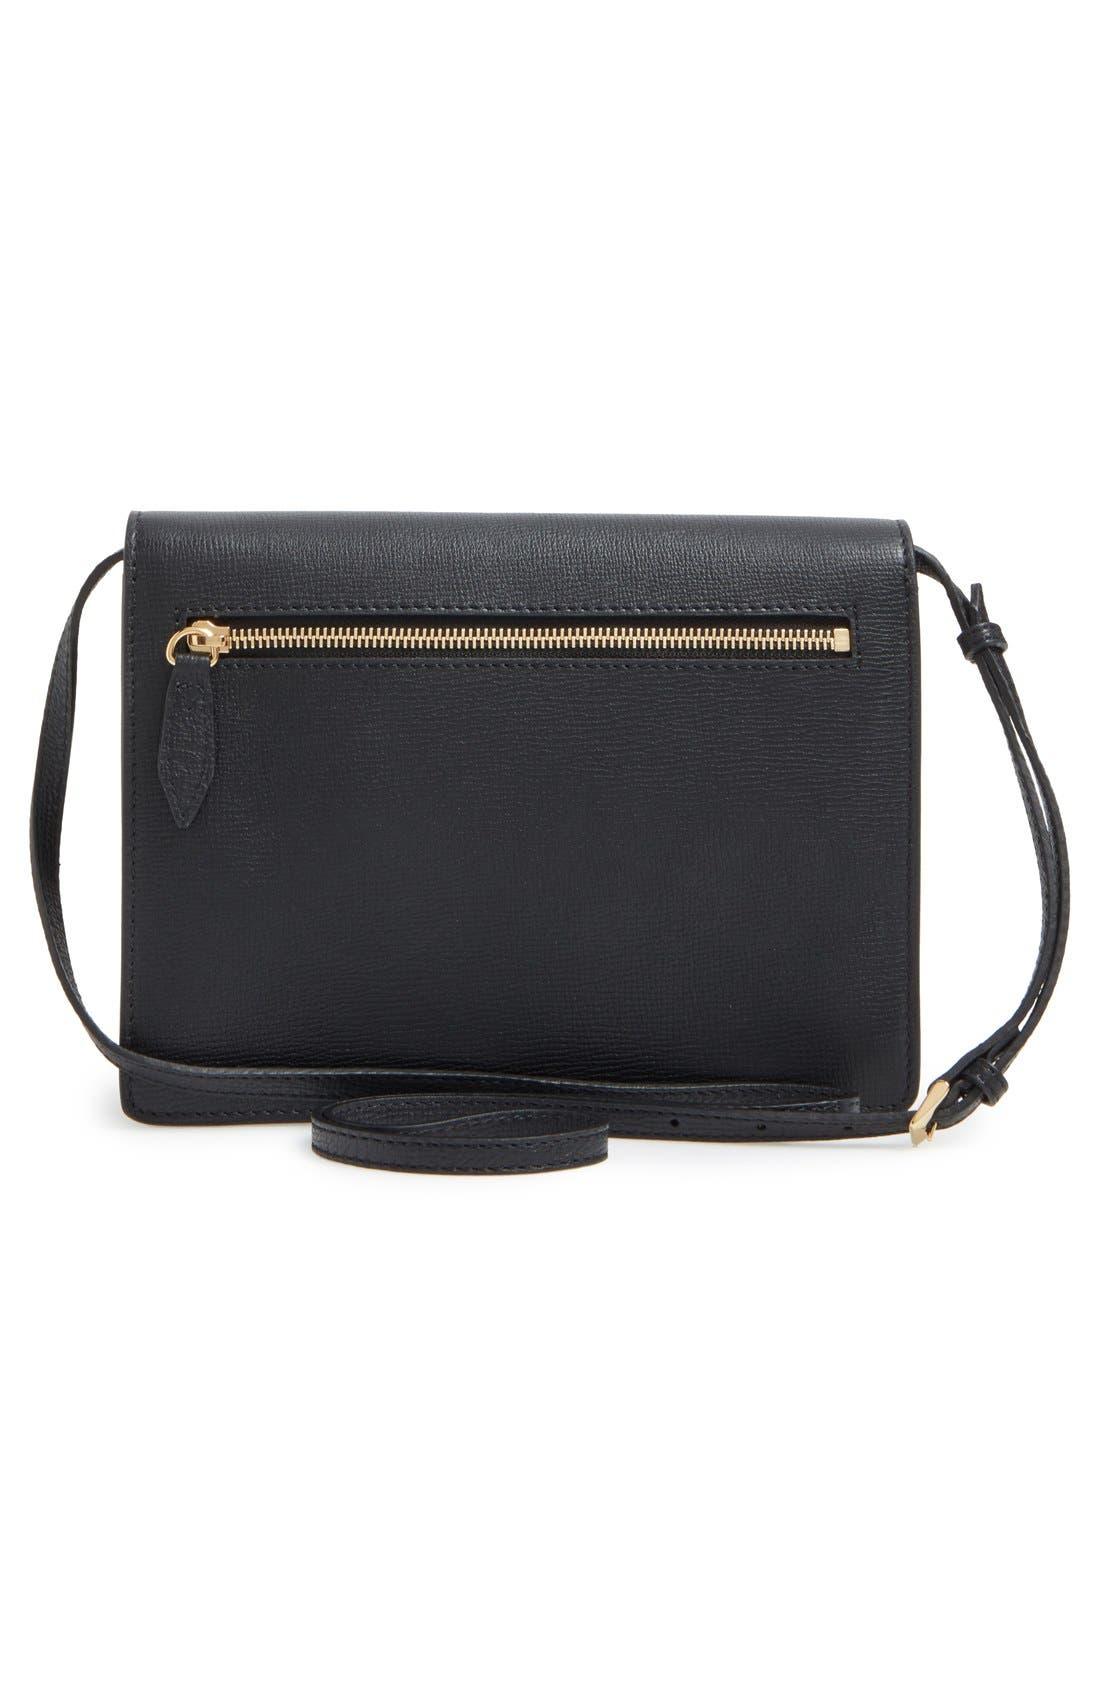 'Small Macken' House Check Crossbody Bag,                             Alternate thumbnail 4, color,                             BLACK